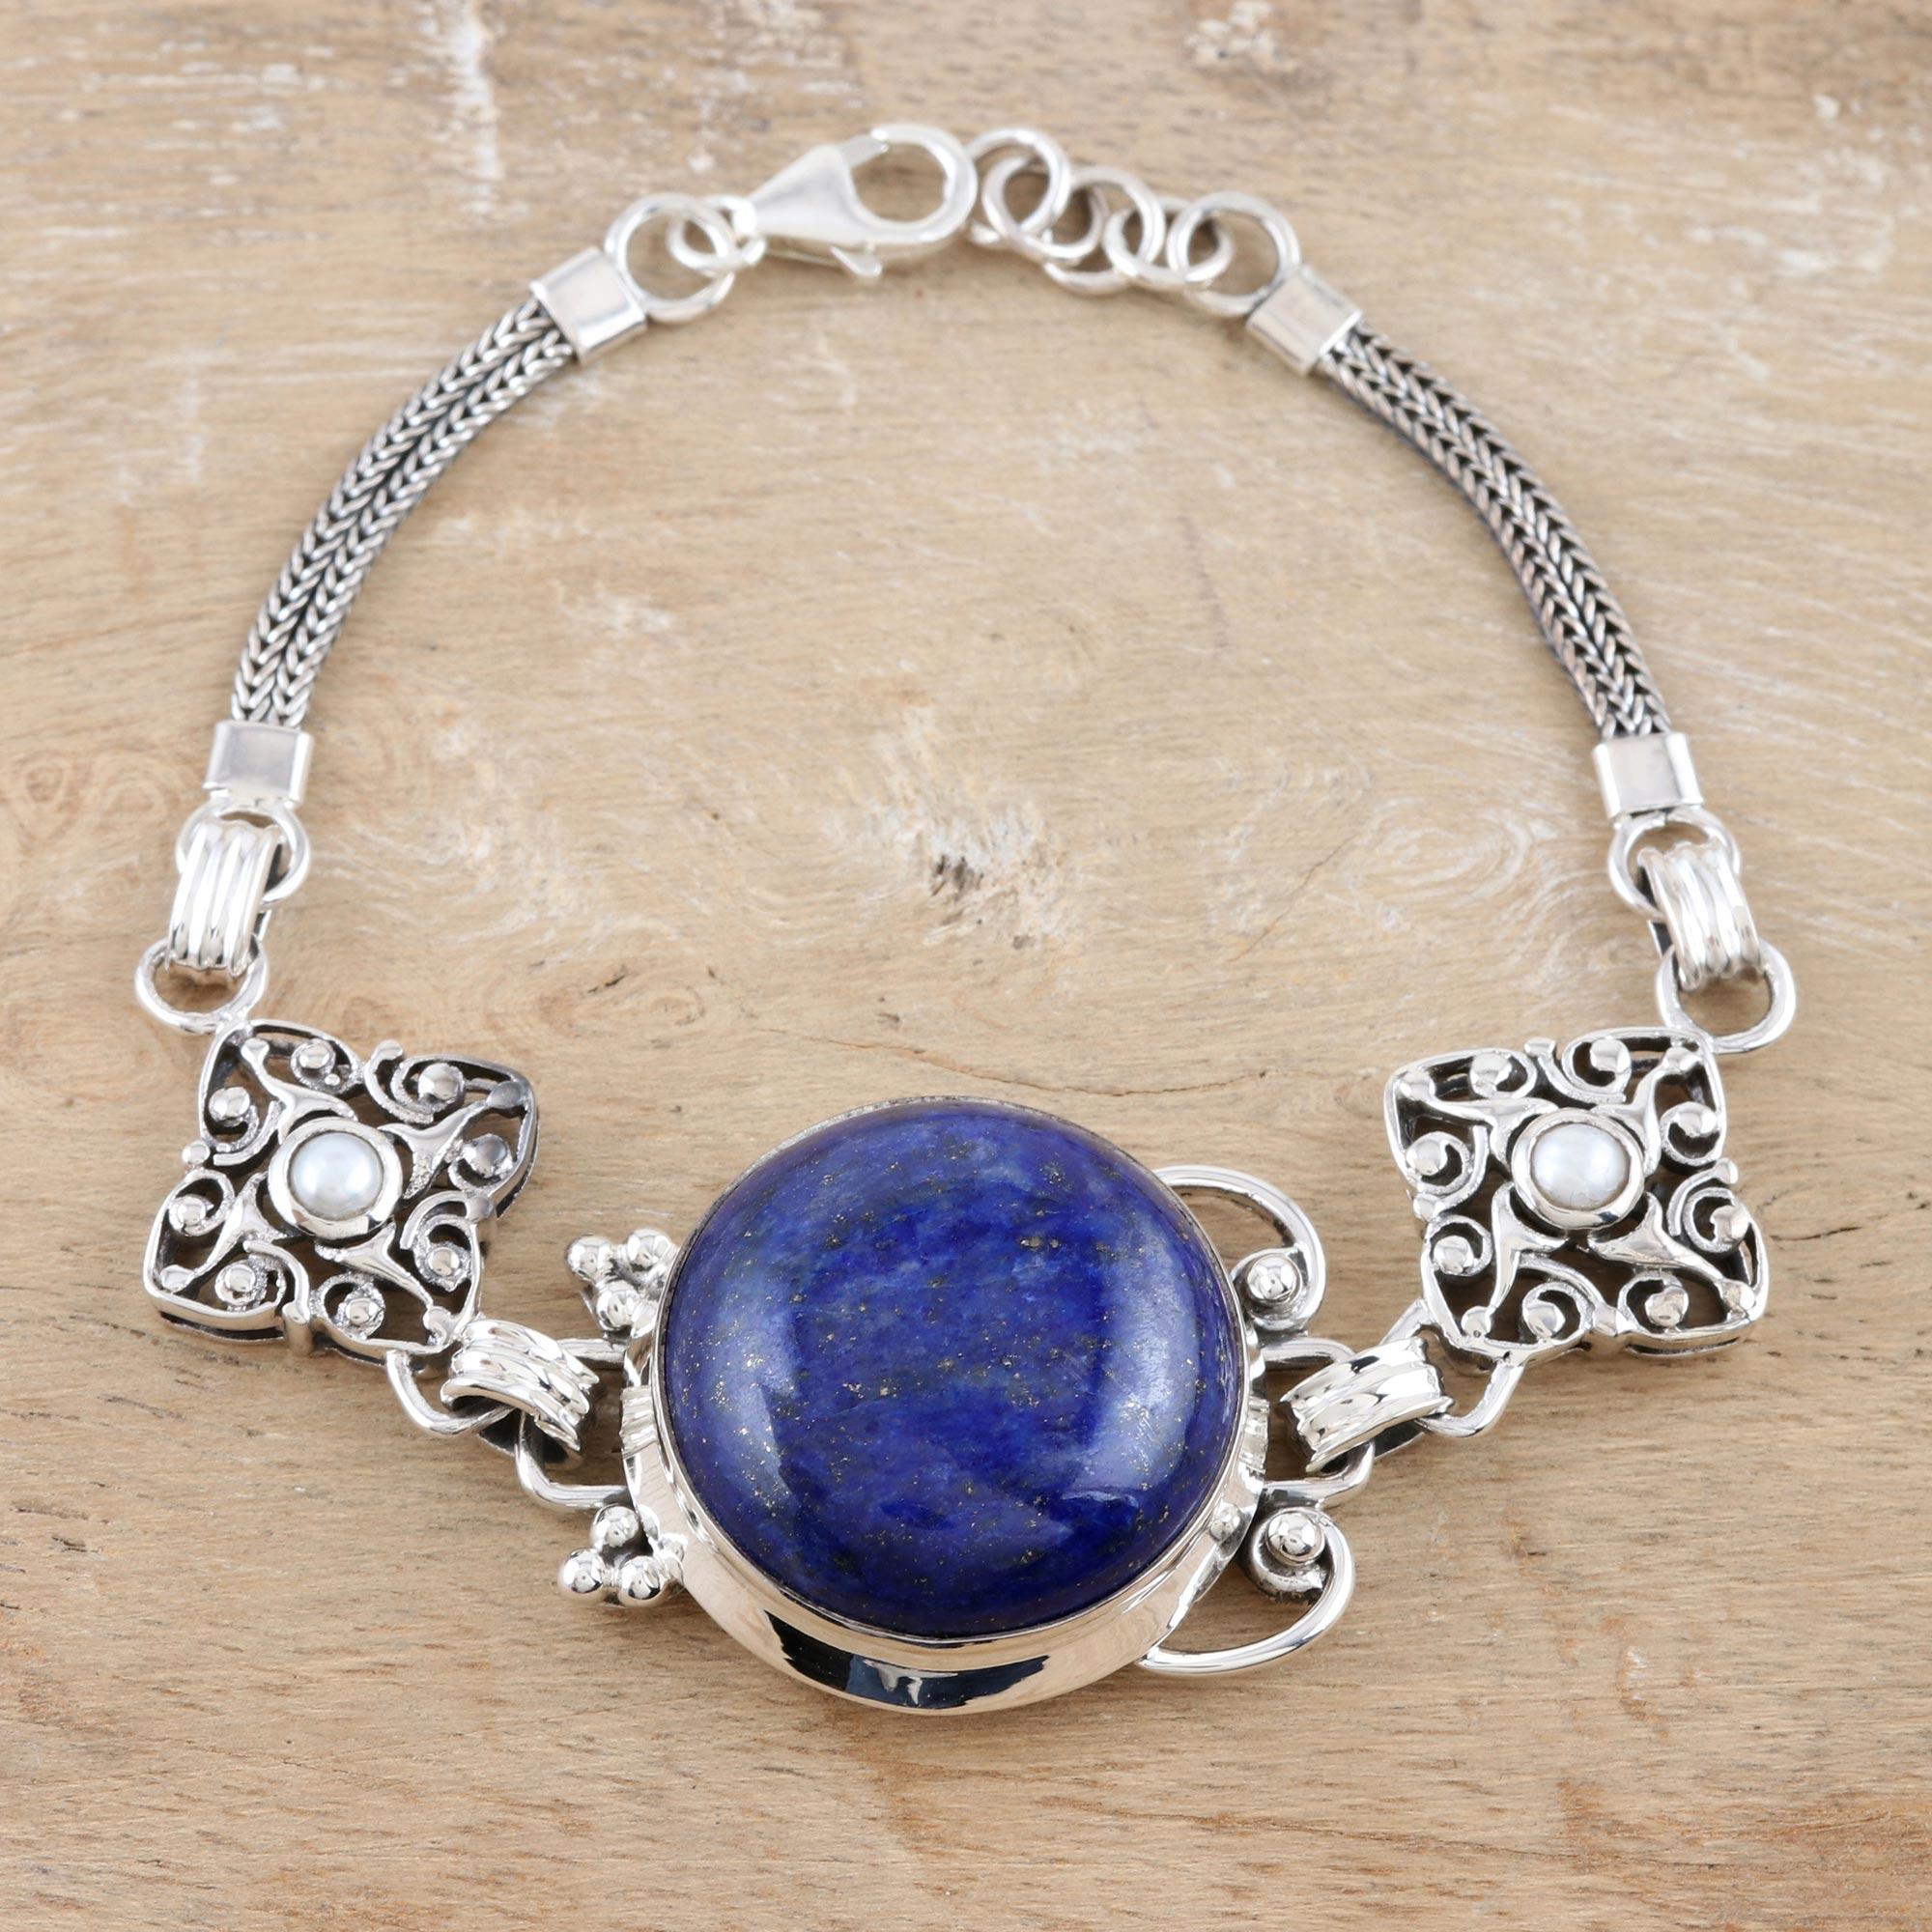 Sterling Silver Lapis Lazuli Bracelet gift set September birthstone necklace Lapis Lazuli pendant Lapis Lazuli Necklace